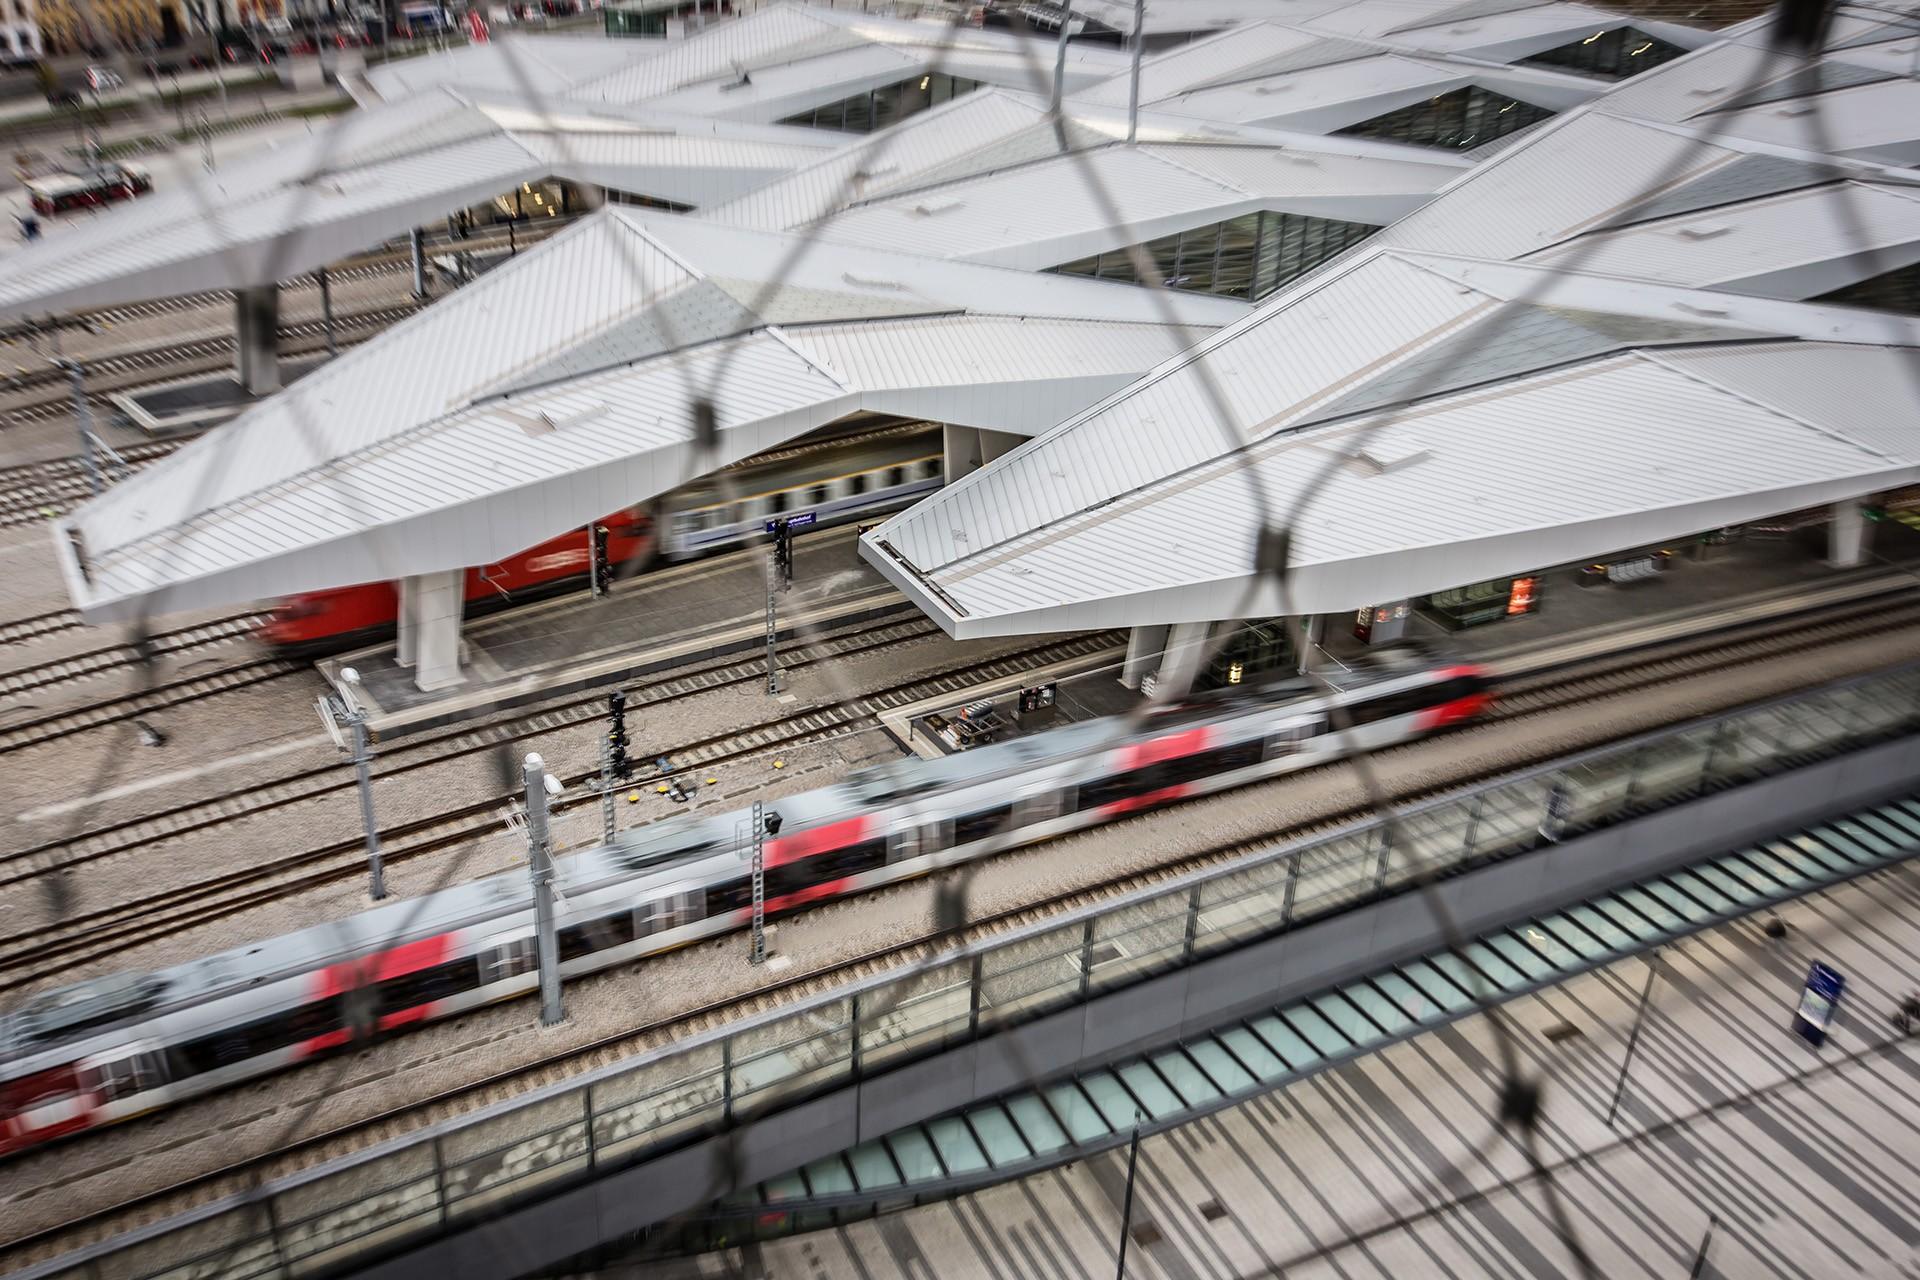 Soli957-Hauptbahnhof--_T8A7610--(C)©MichaelMazohl--1280px